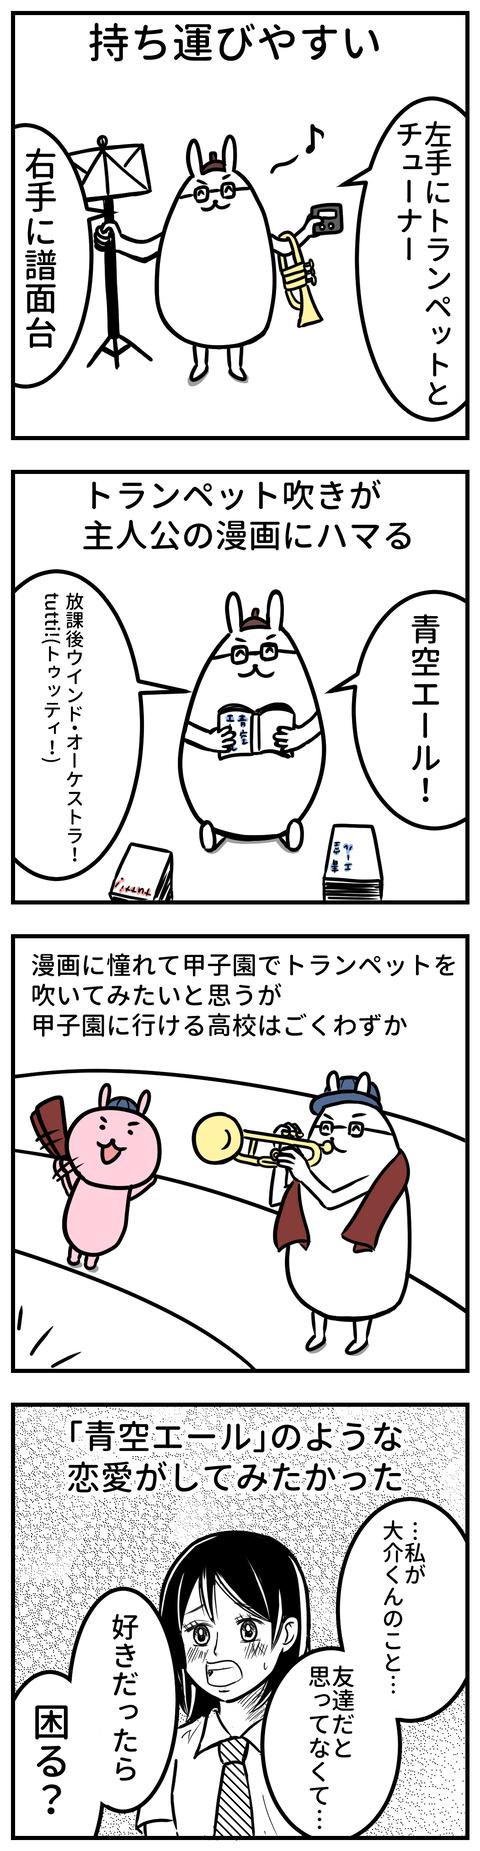 manga-yuzuporo77-1